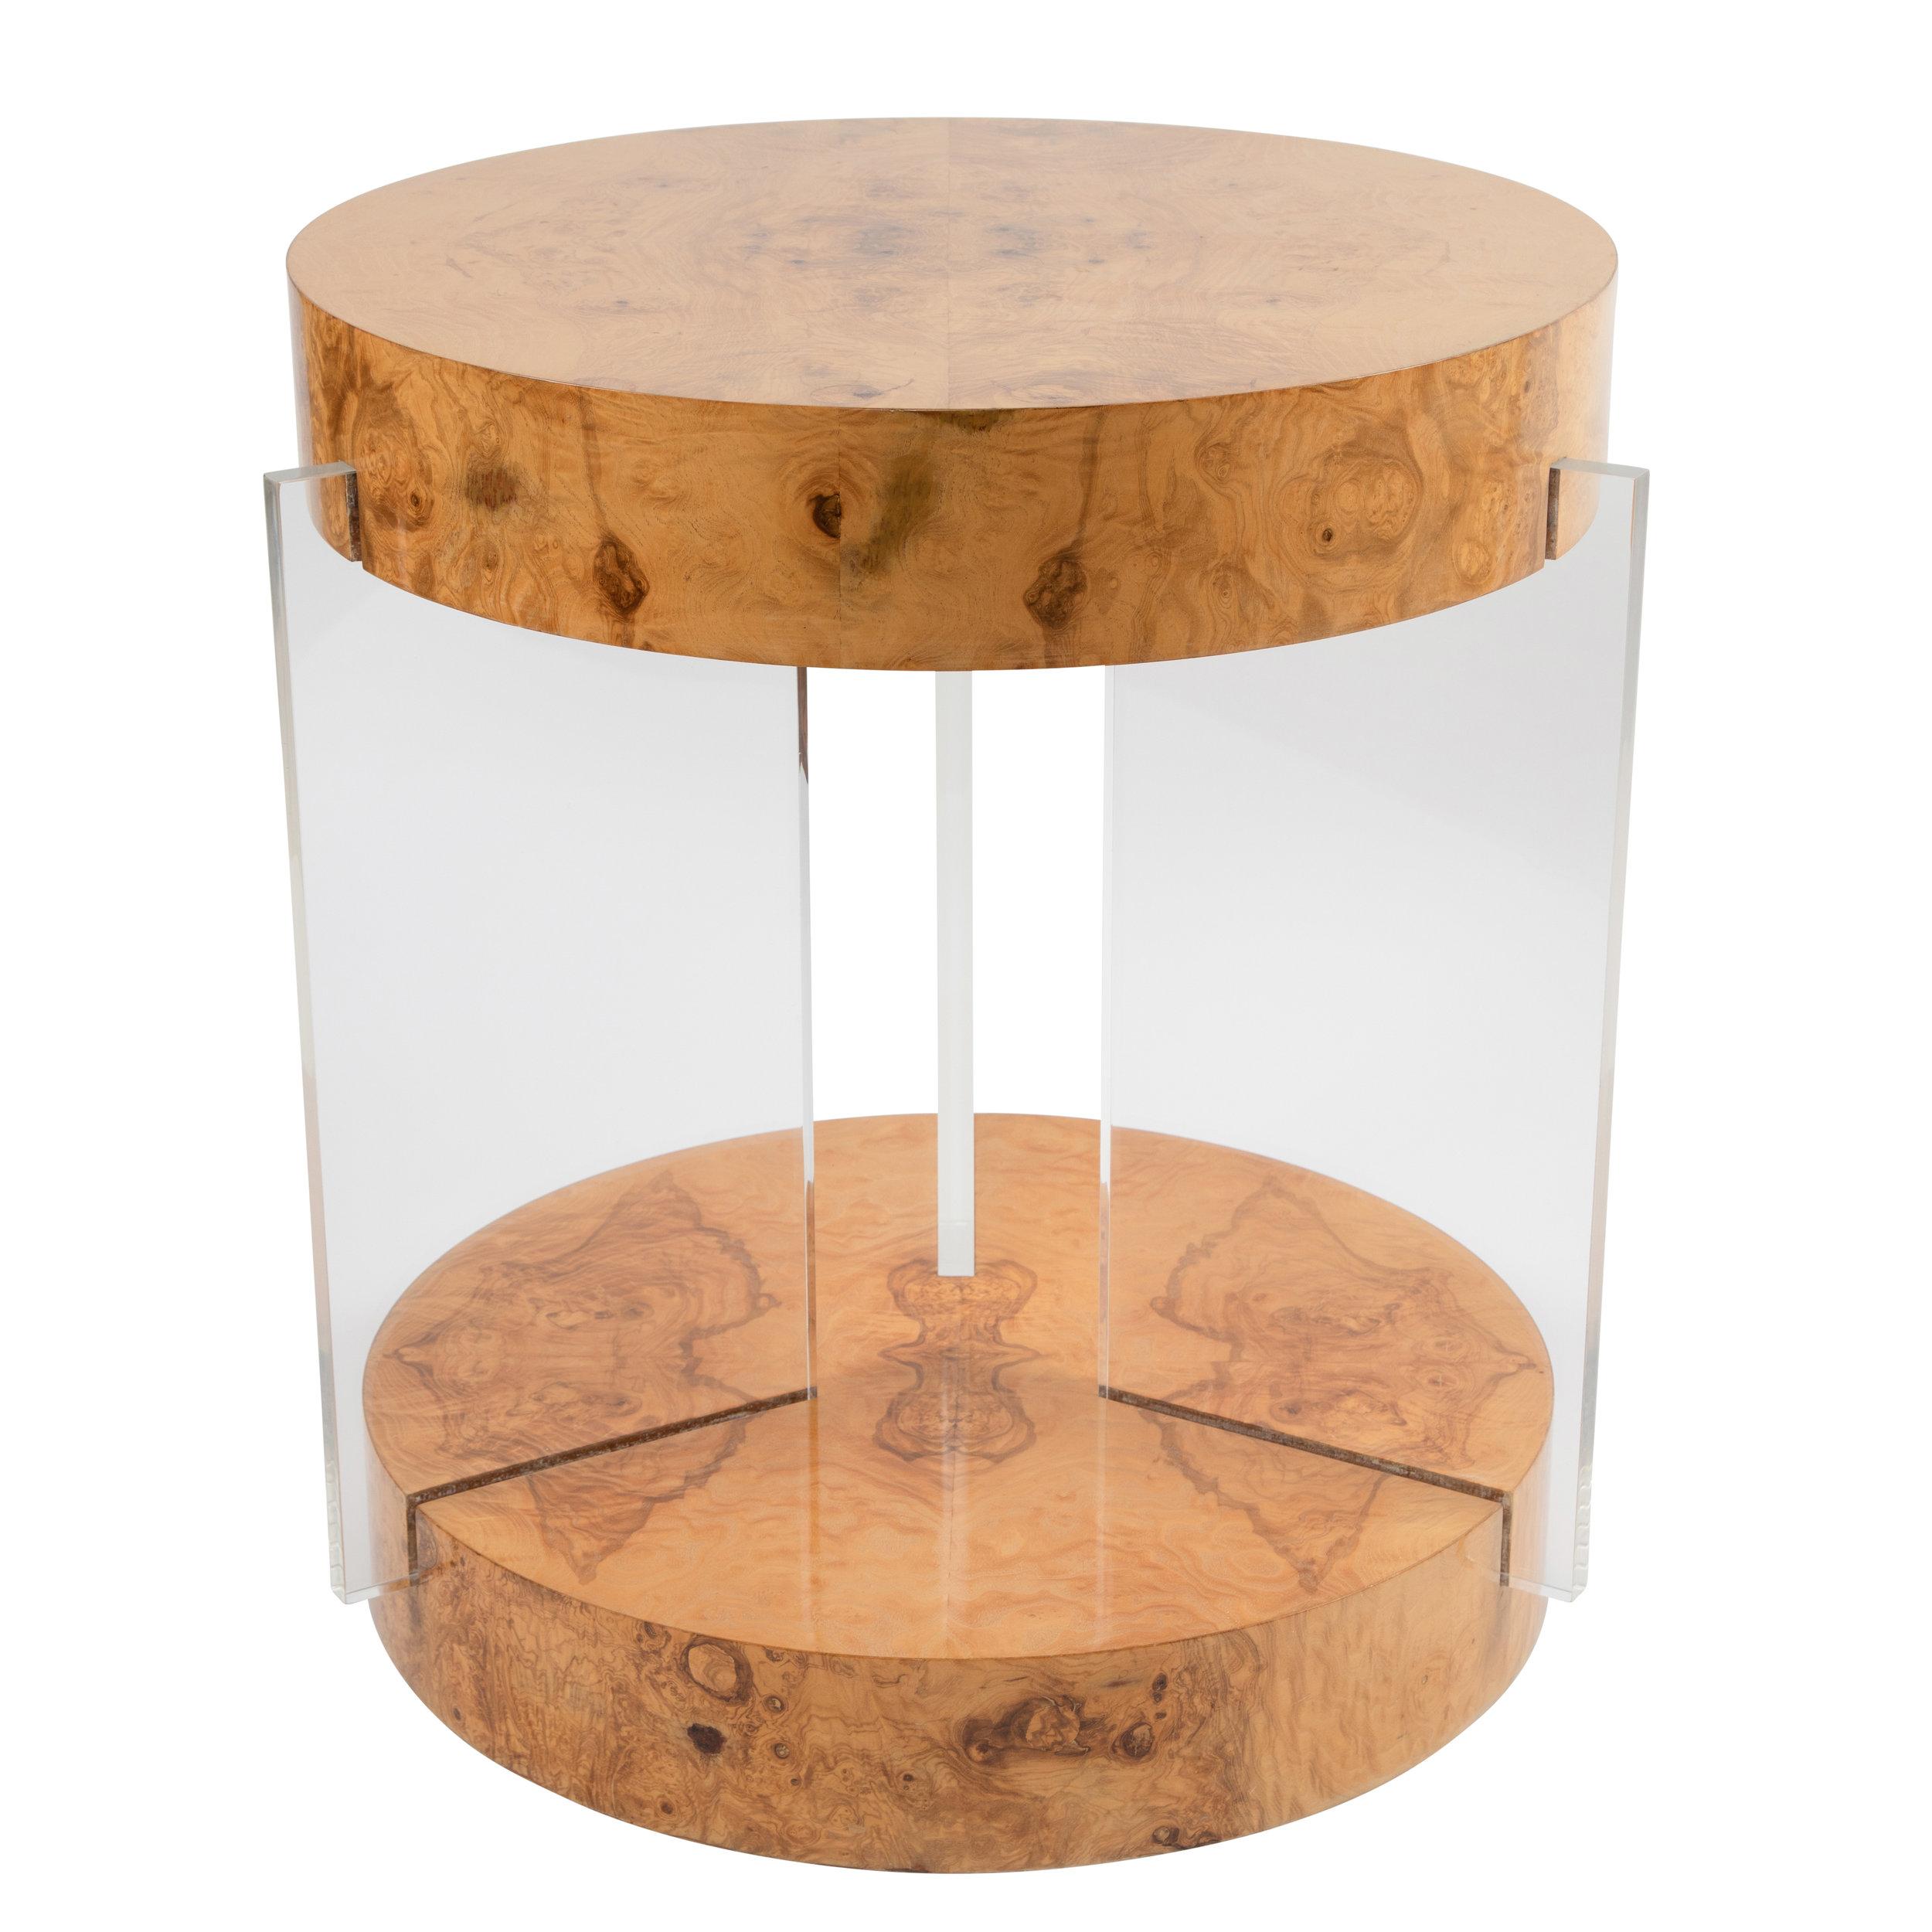 burk_lucite_table-10.jpg